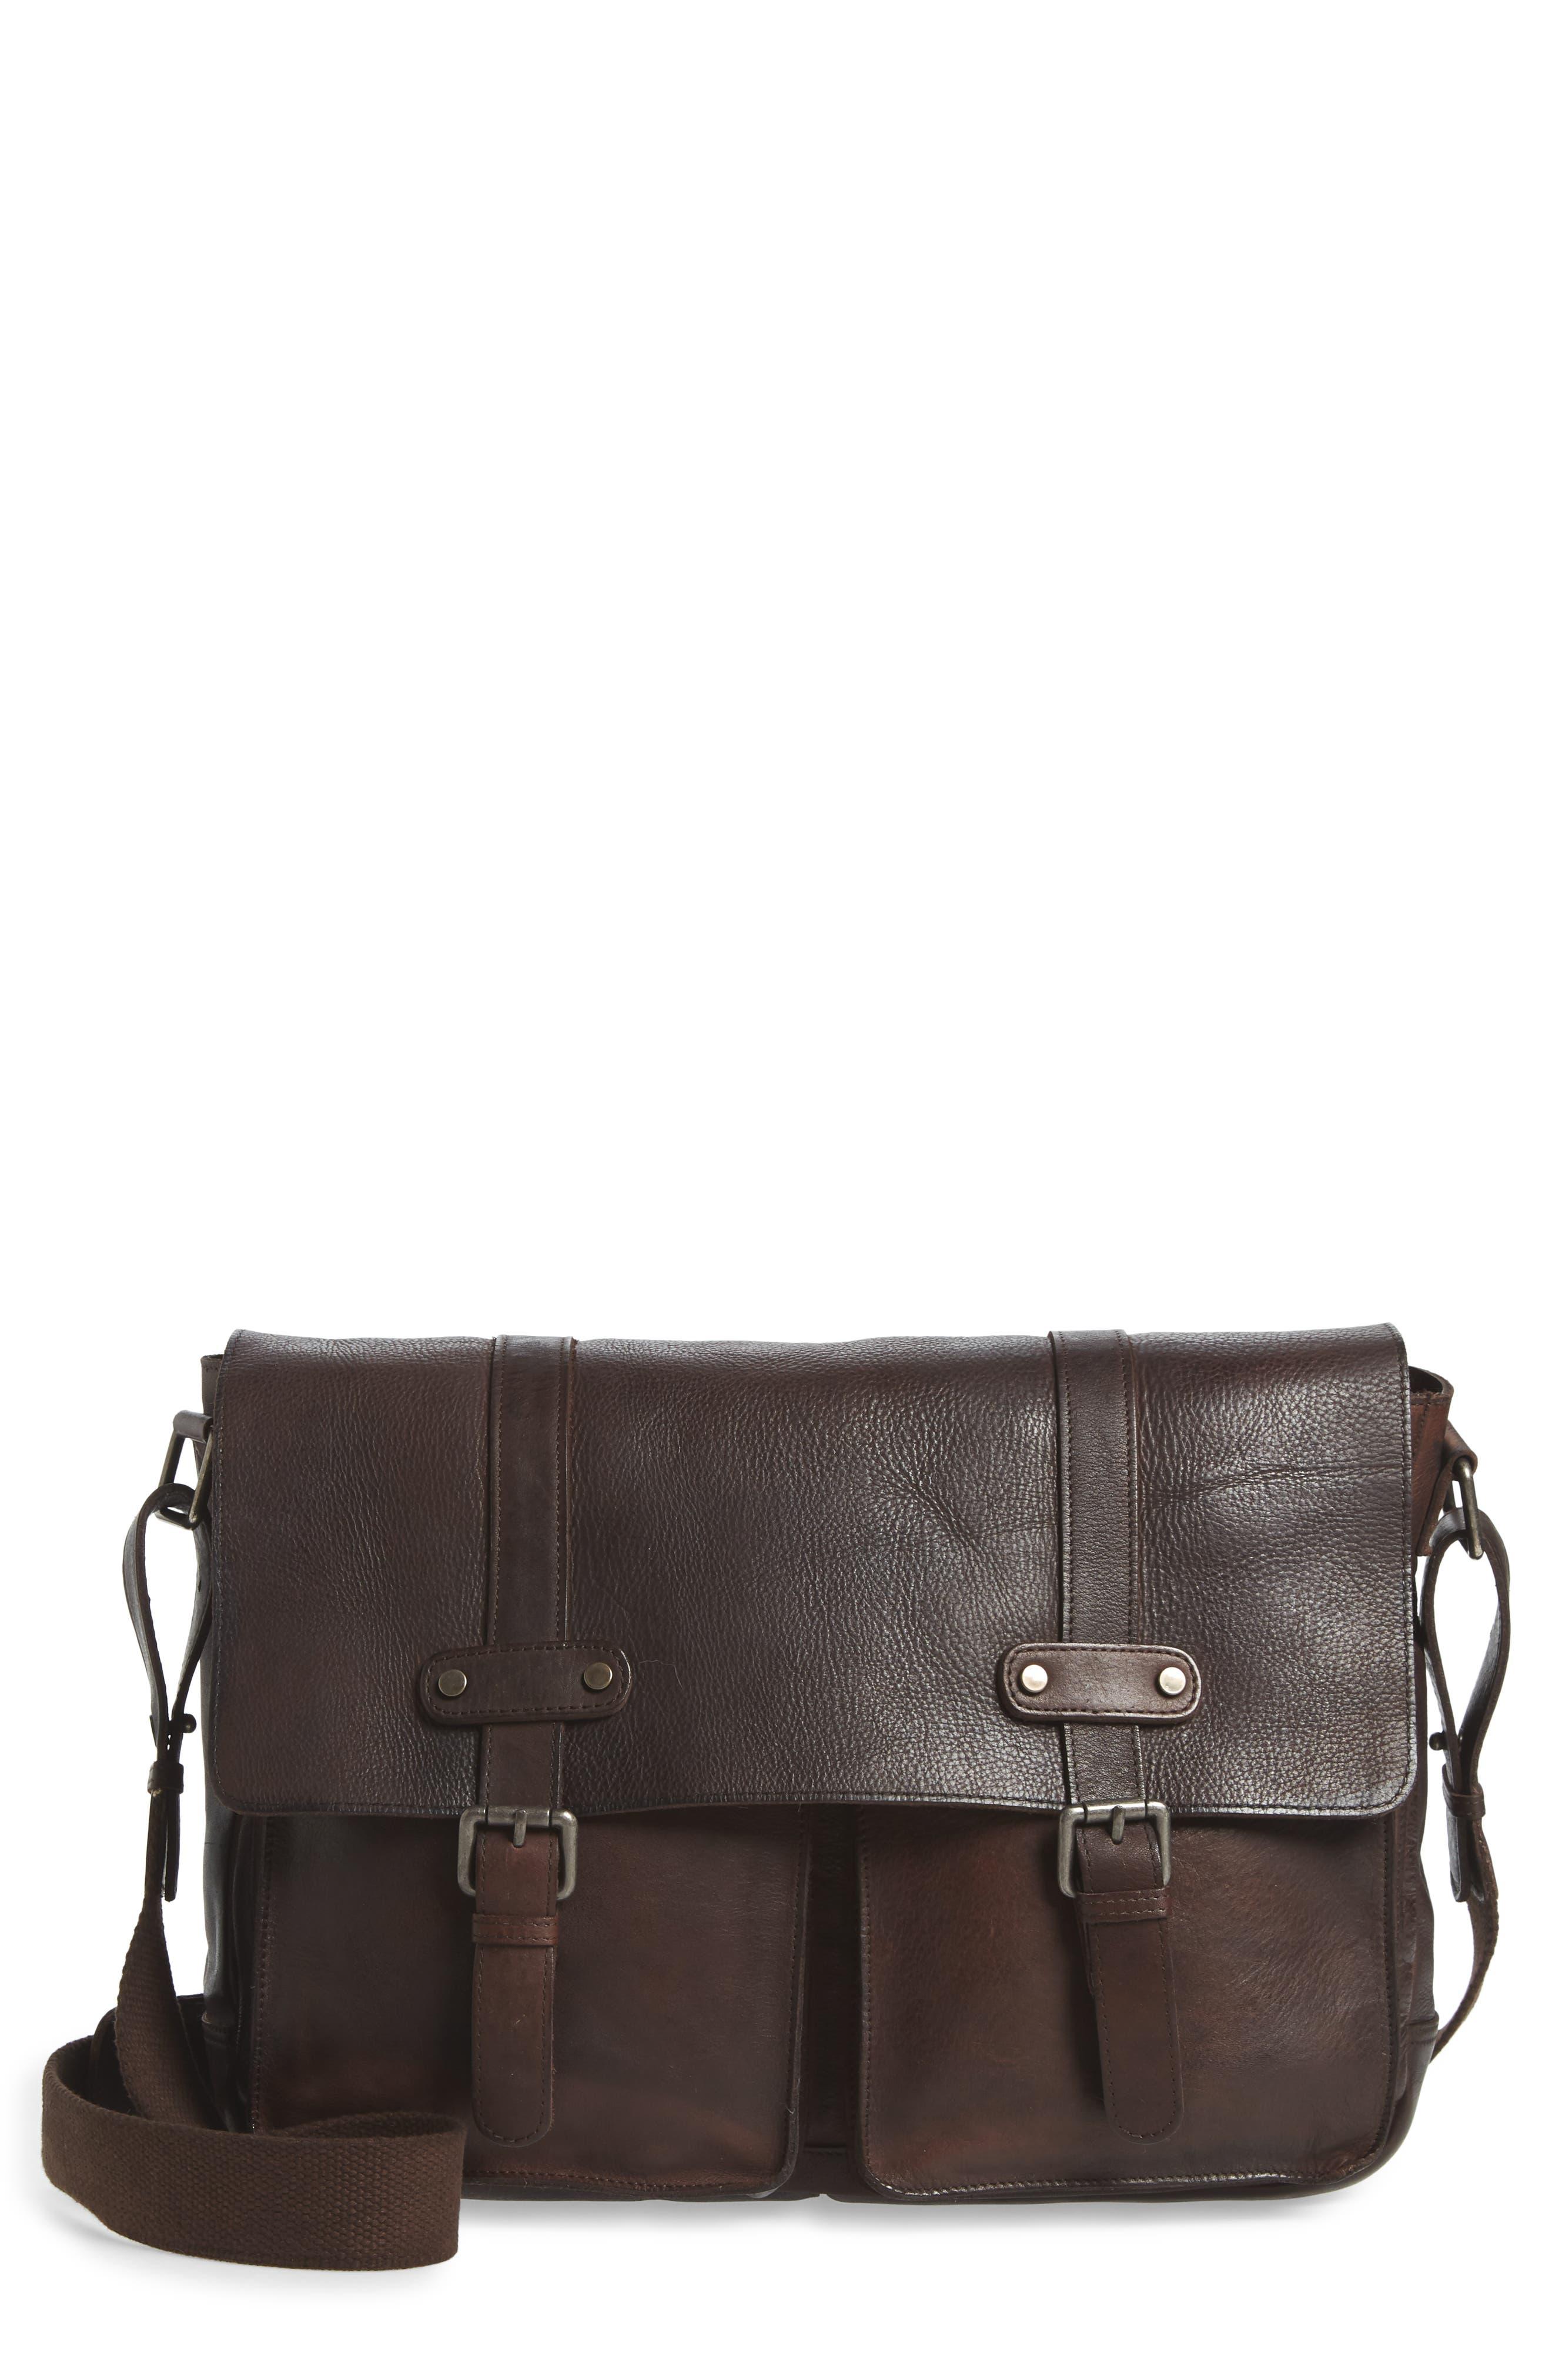 Women Ladies Men/'s Leather Messenger Bag Shoulder Crossbody Business Handbag New